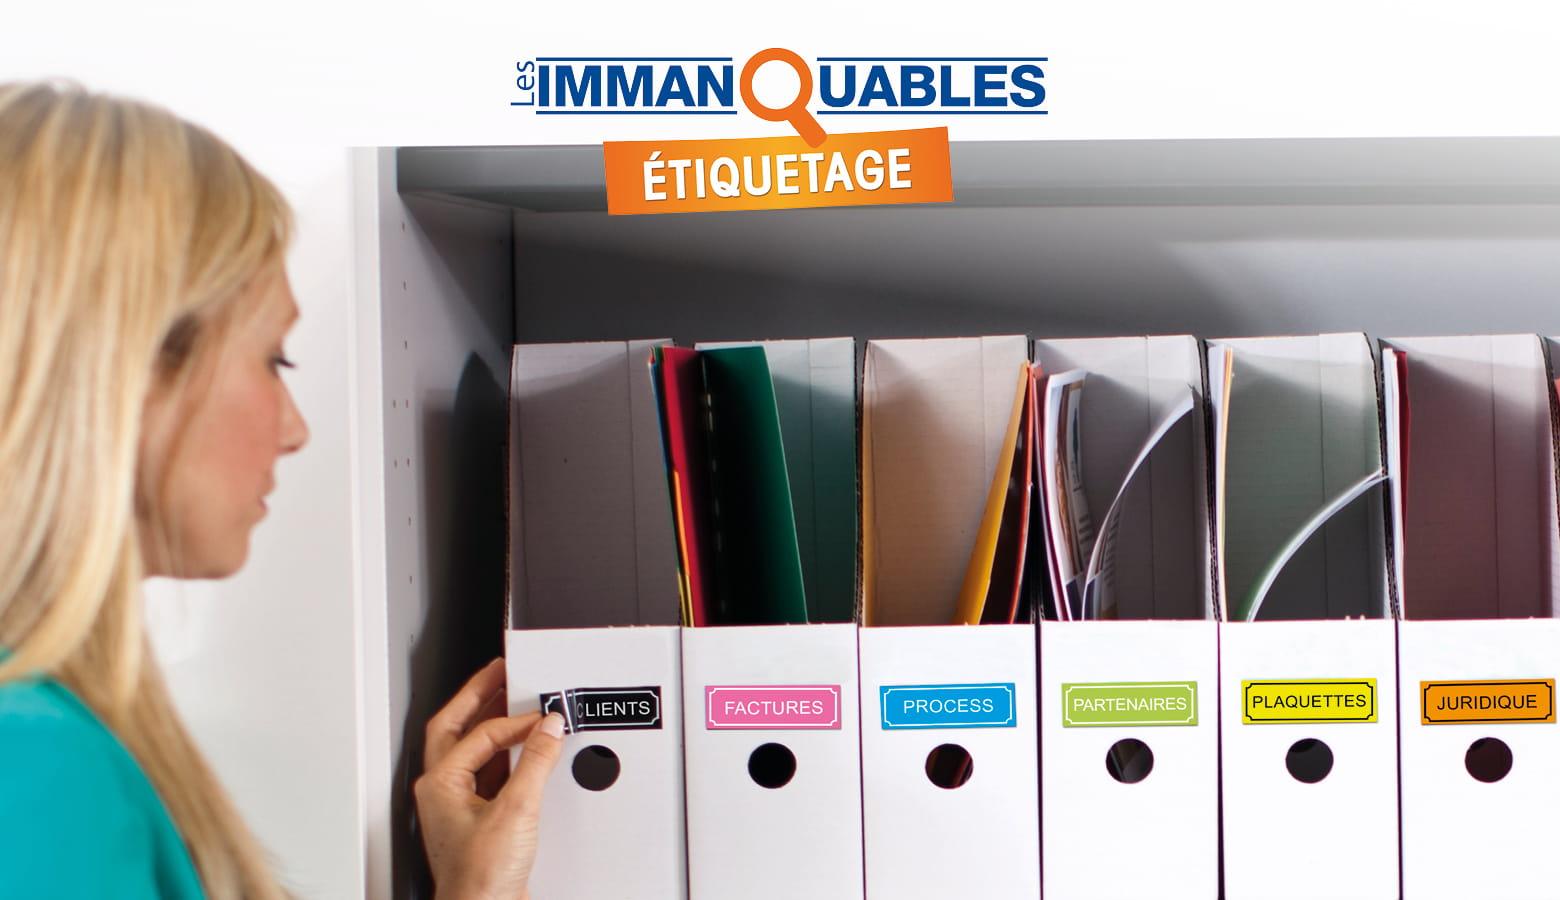 Immanquables Solutions d'Etiquetage - Promotions et offres Brother